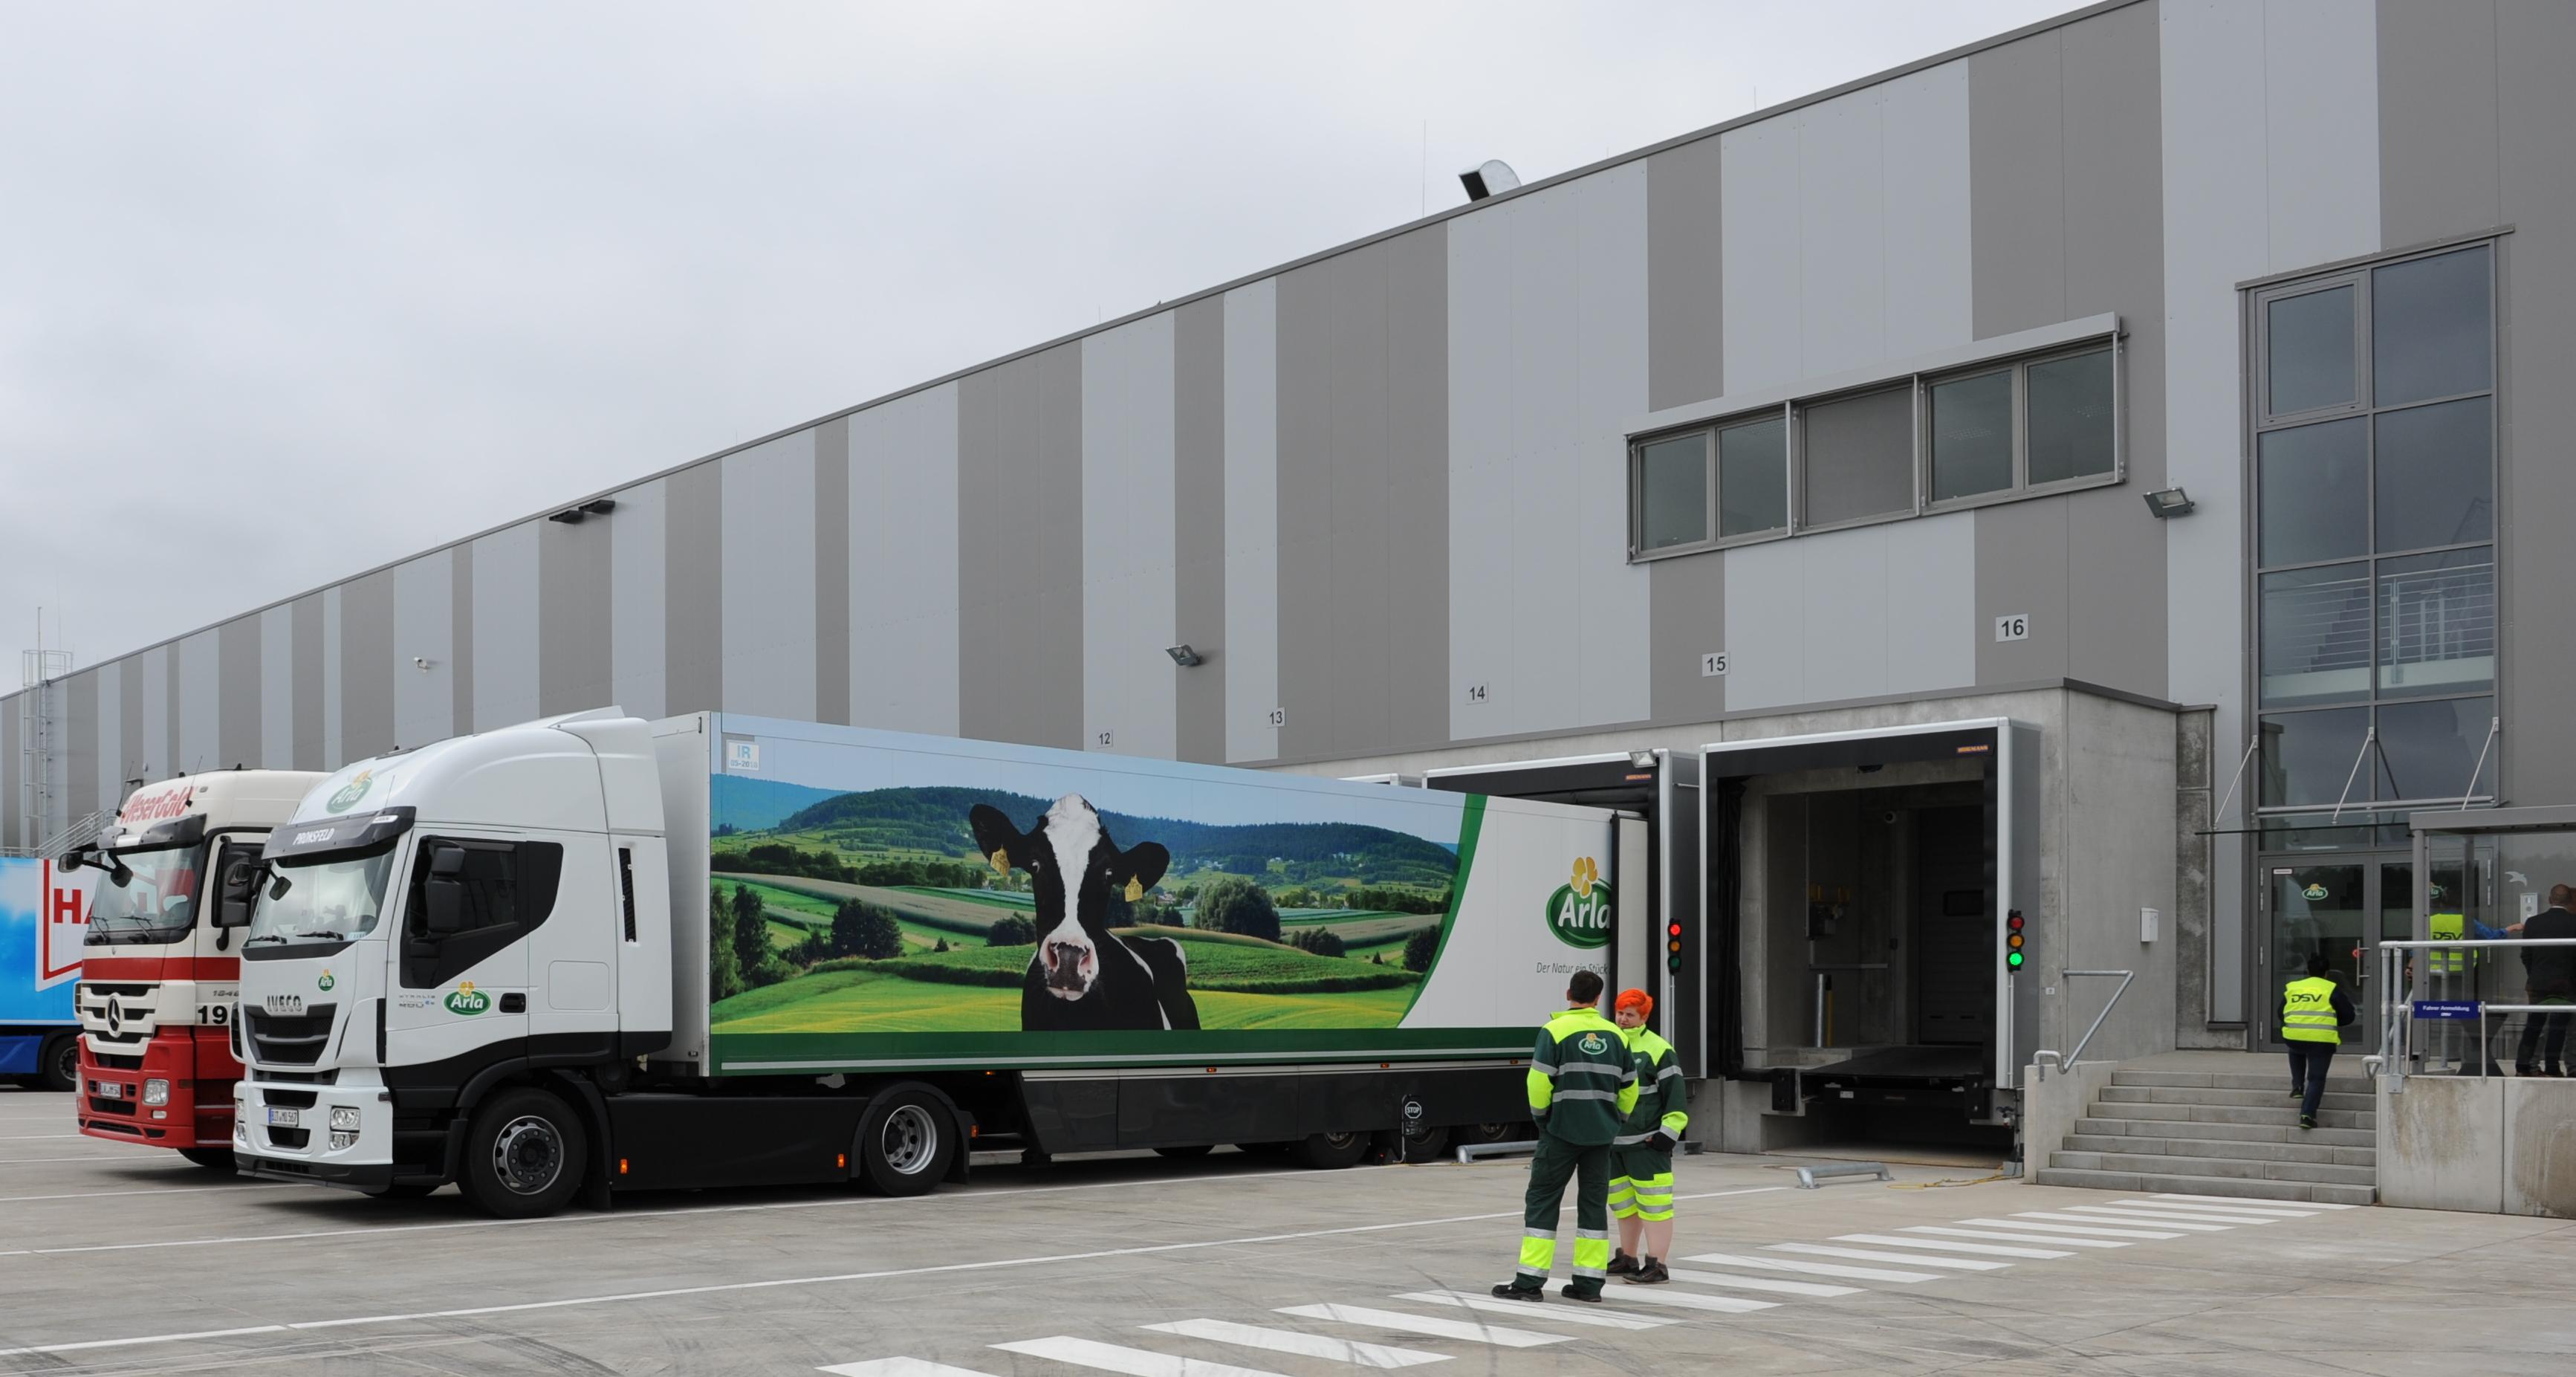 Arla opens new distribution terminal near Hamburg